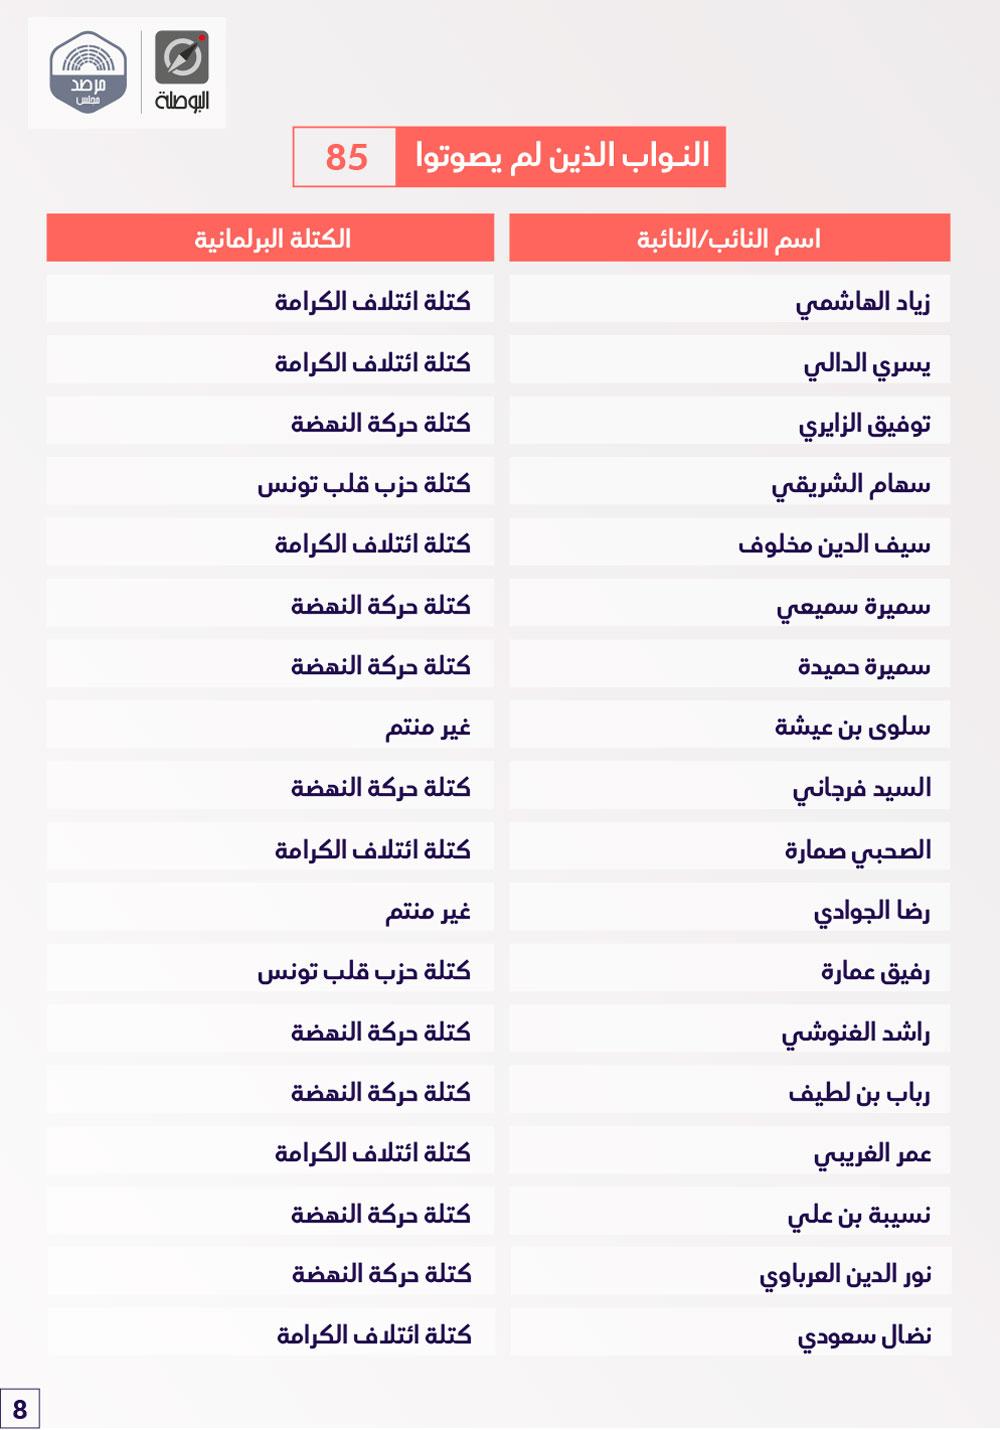 vote-bawsala-300720--8.jpg